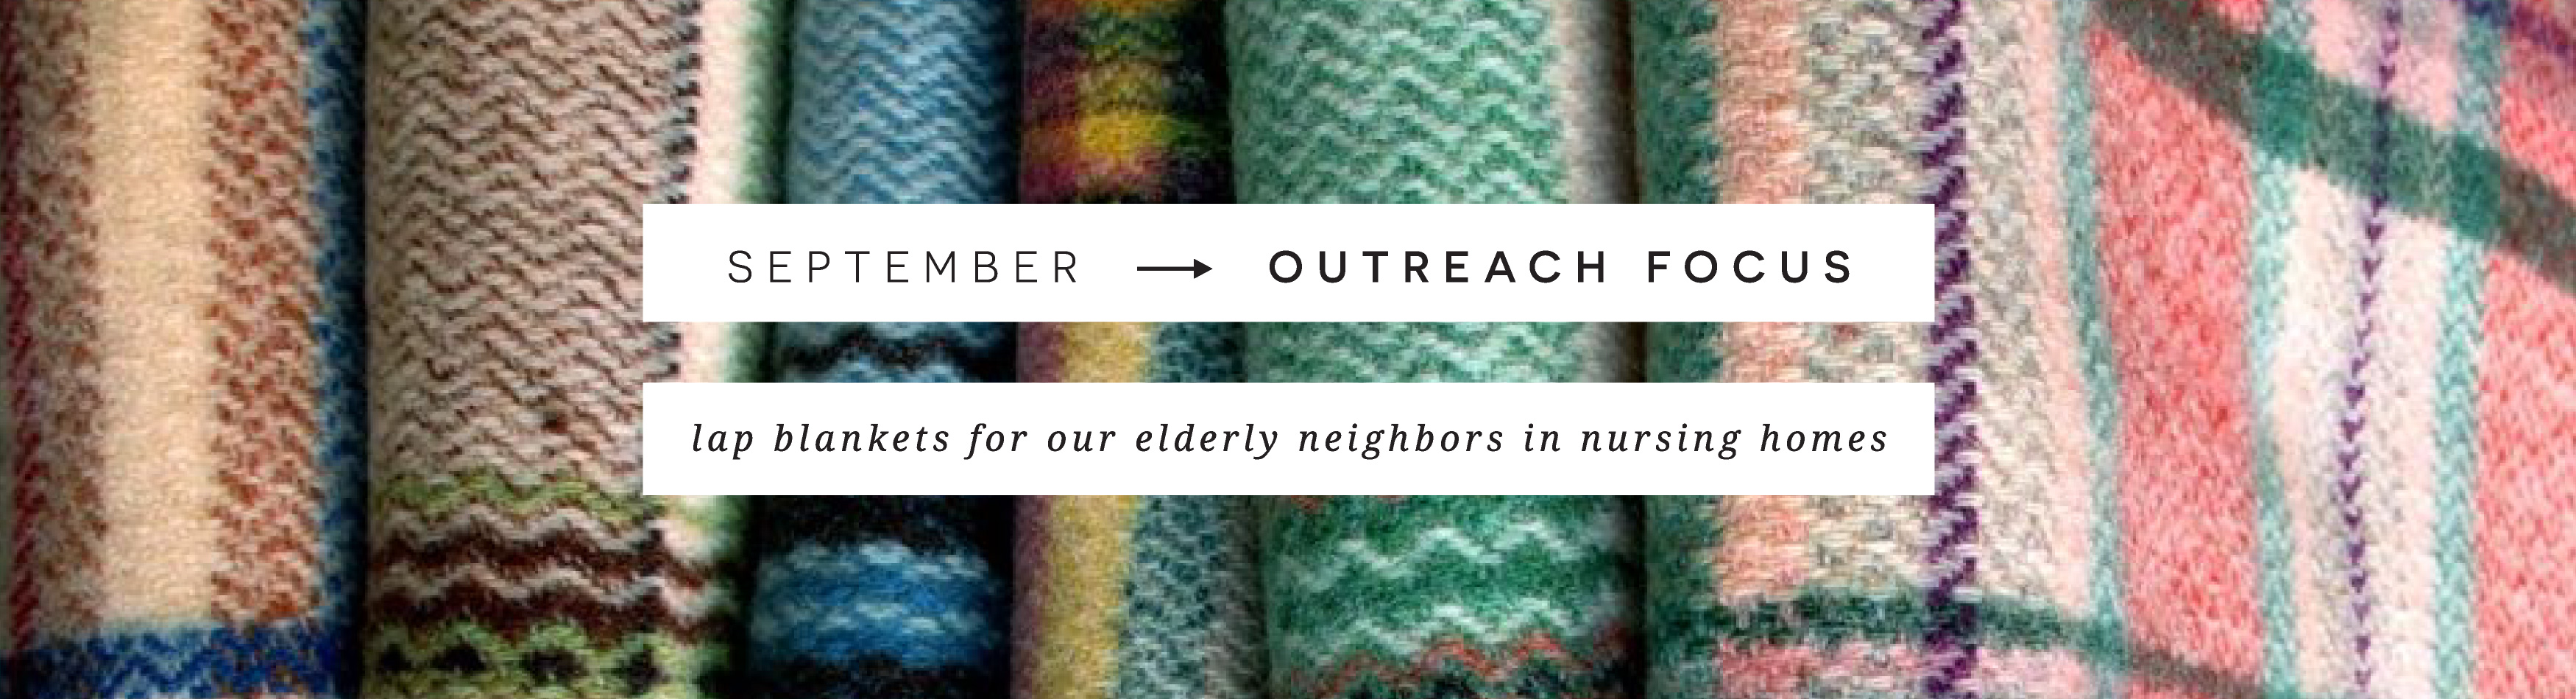 september-outreach-focus_web-banner